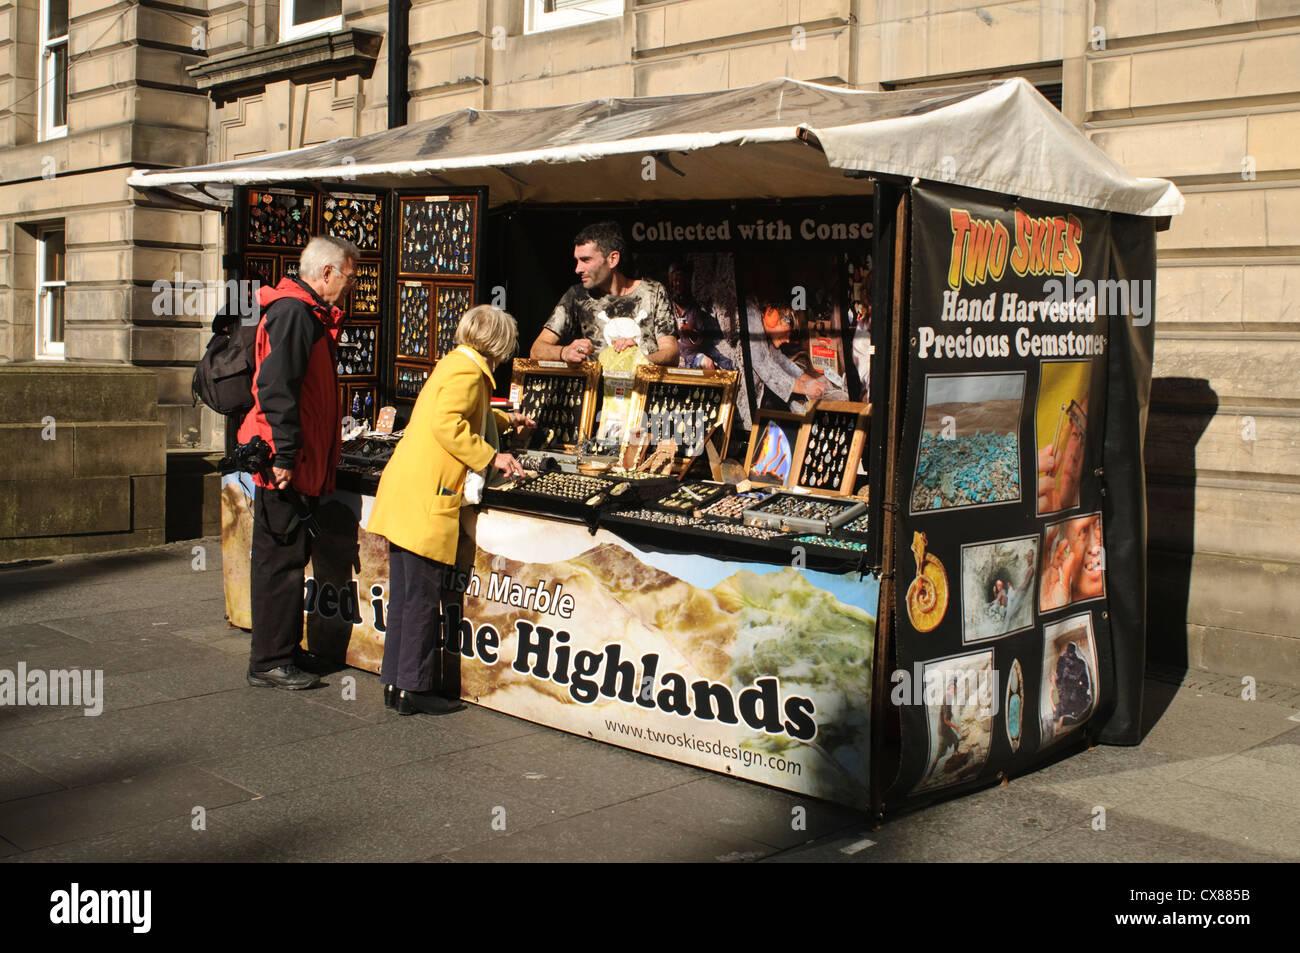 Street trader on Edinburgh's Royal Mile. - Stock Image